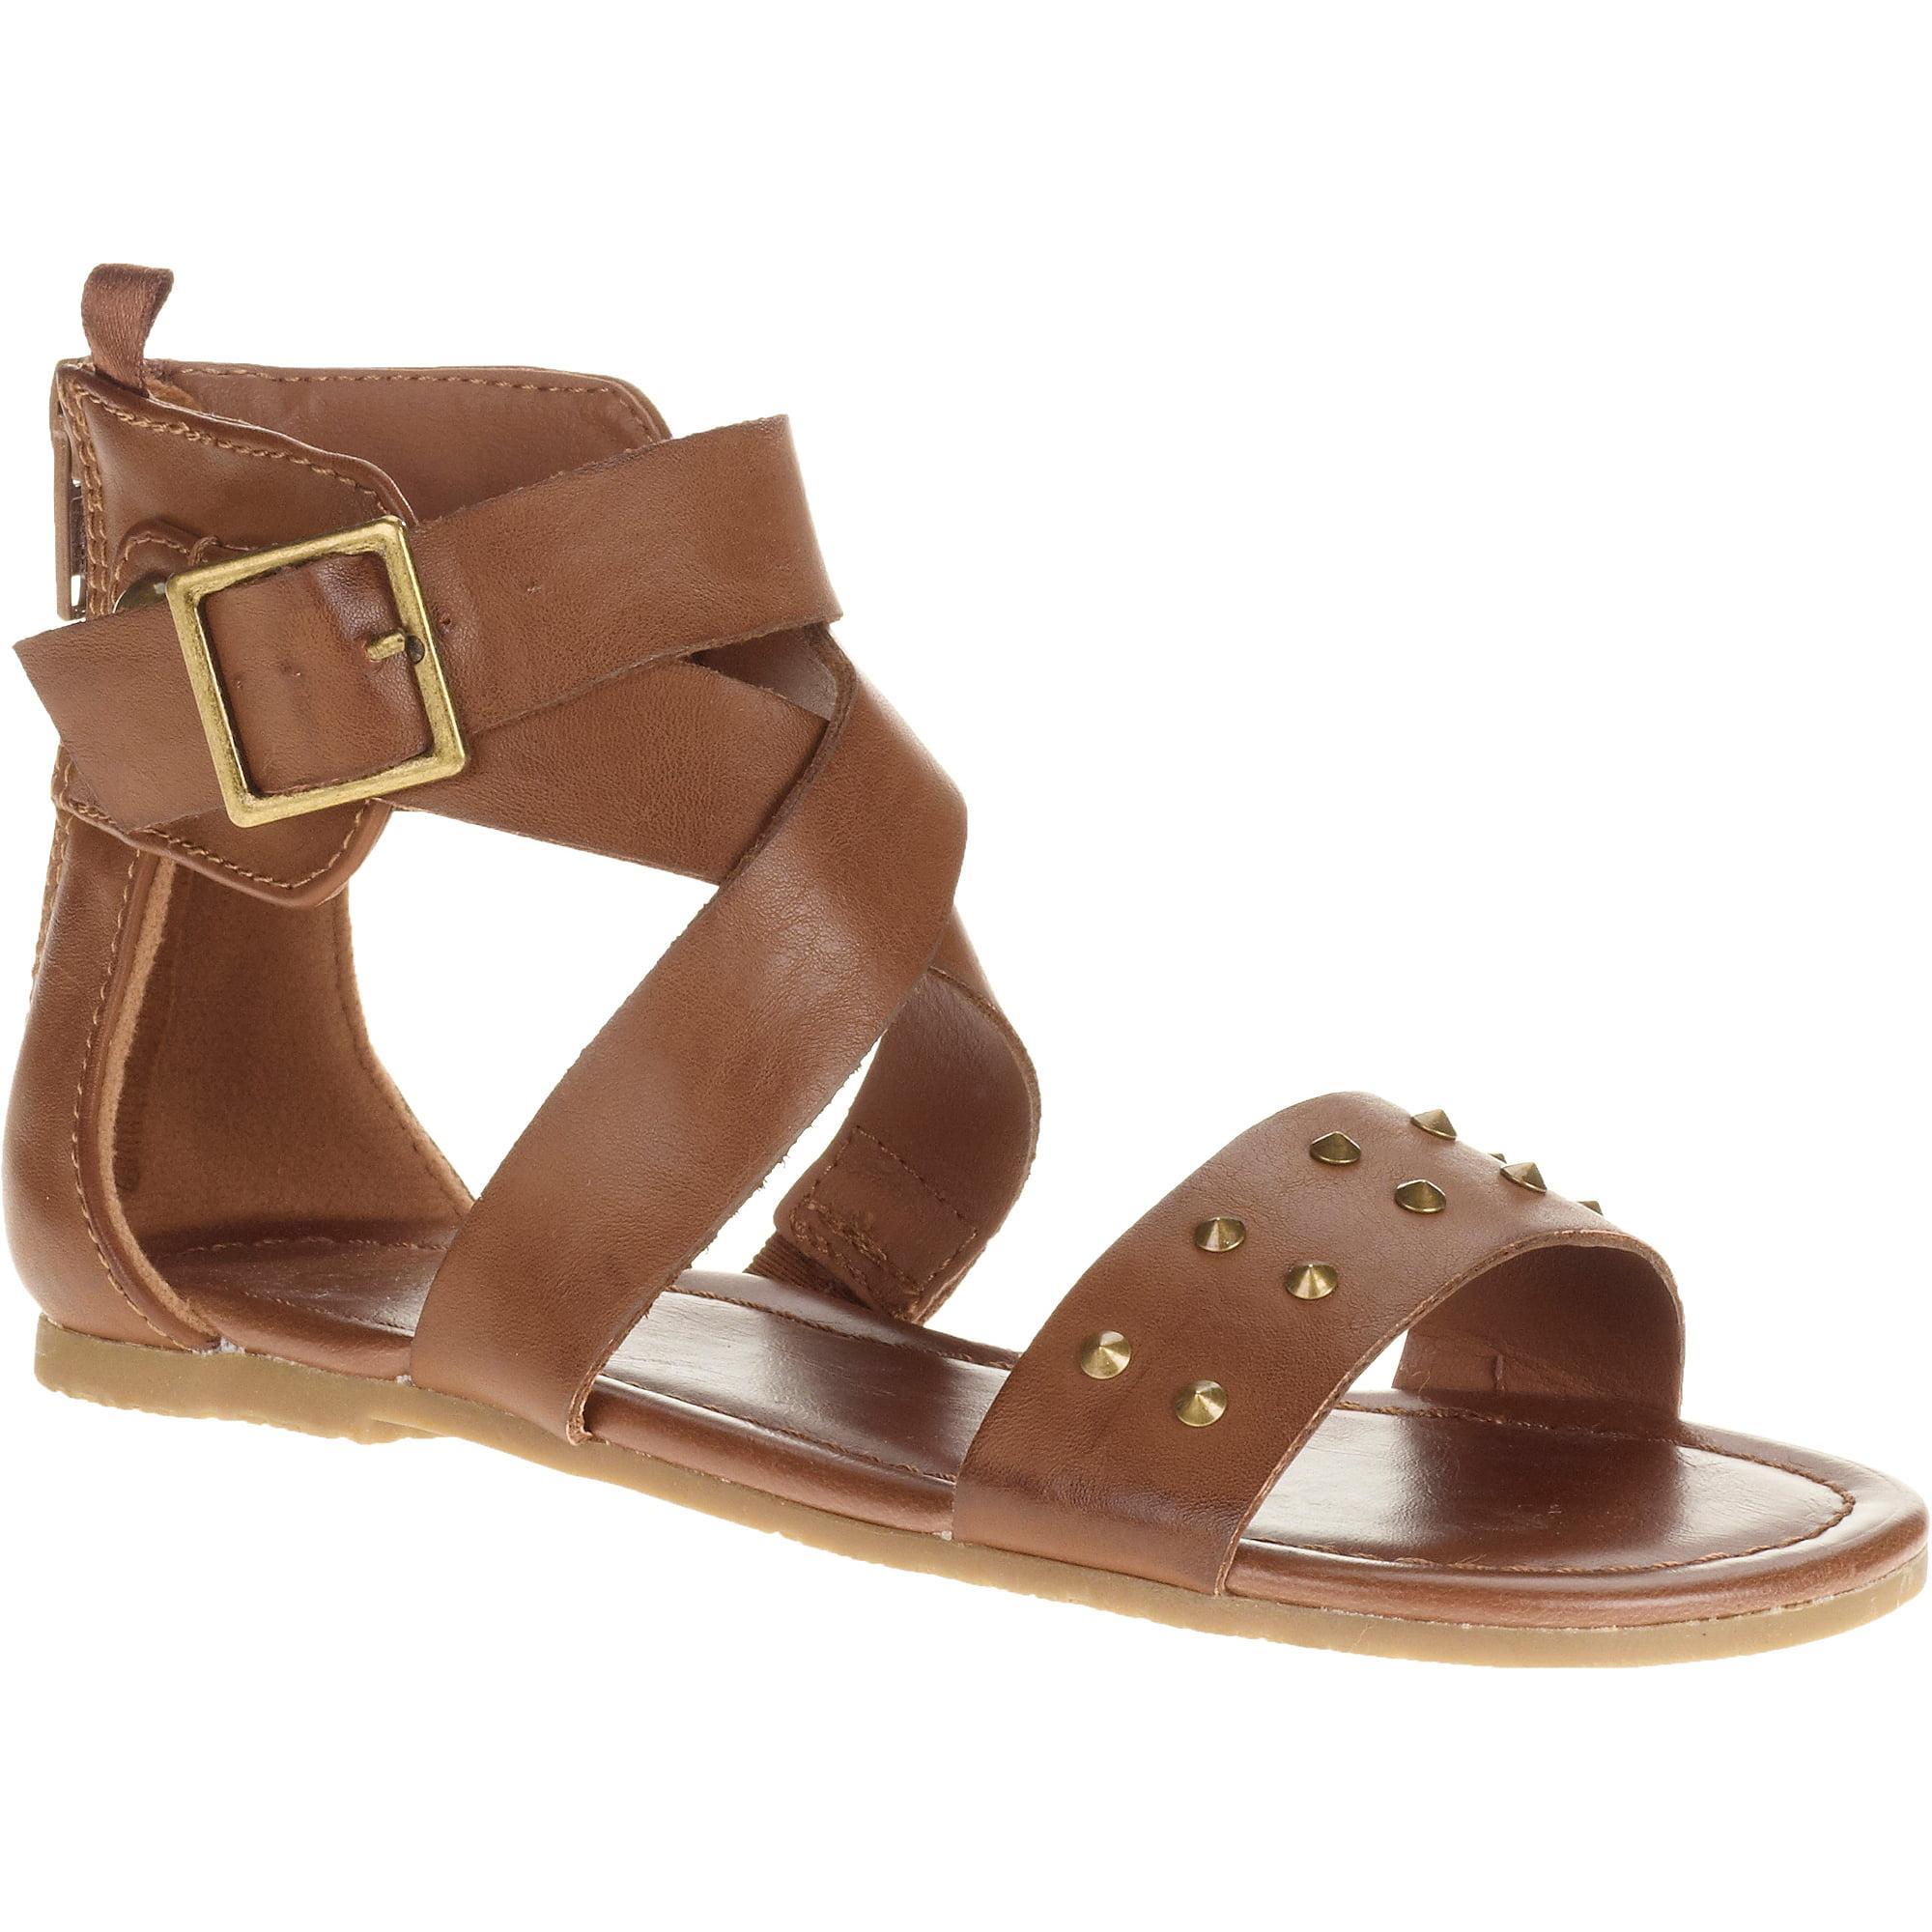 Faded Glory Girls' Gladiator Sandal